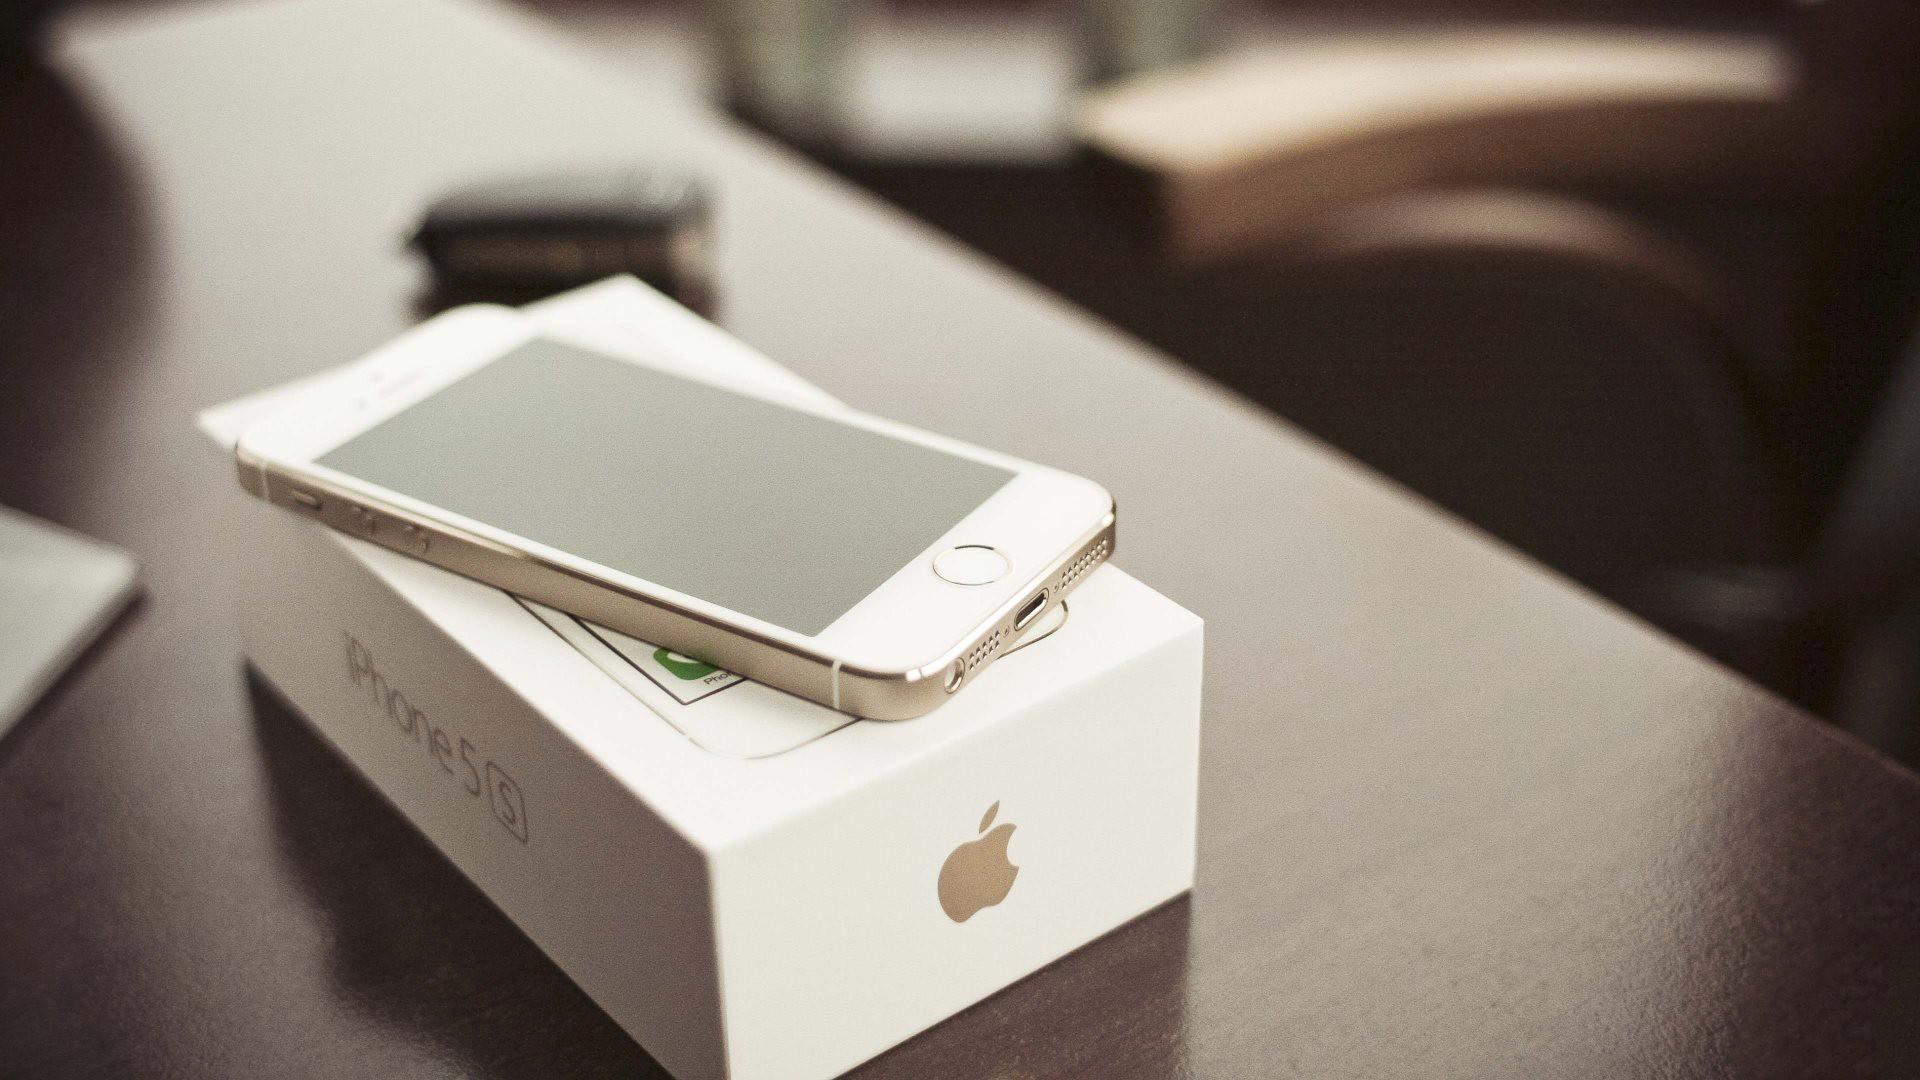 Wallpaper za iphone - Iphone 5s Gold Hd Wallpaper New Hd Wallpapers